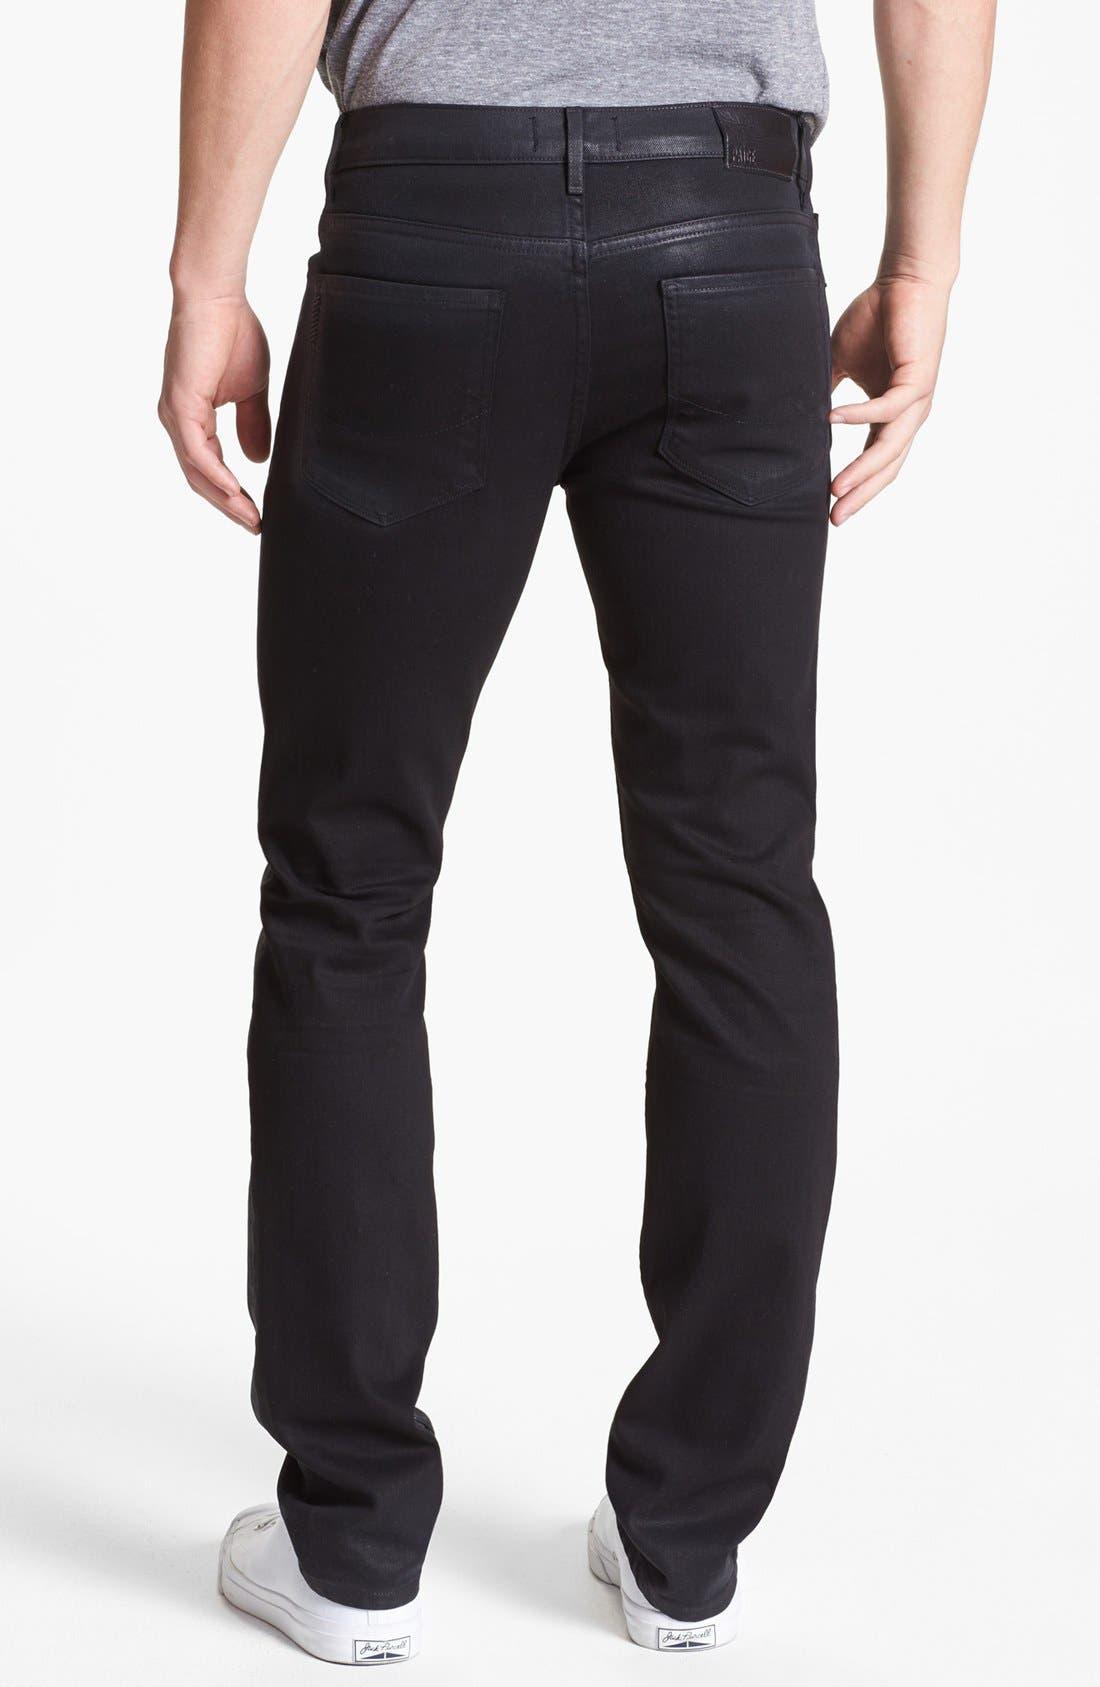 Main Image - PAIGE 'Federal' Coated Slim Fit Jeans (Oil Slick)